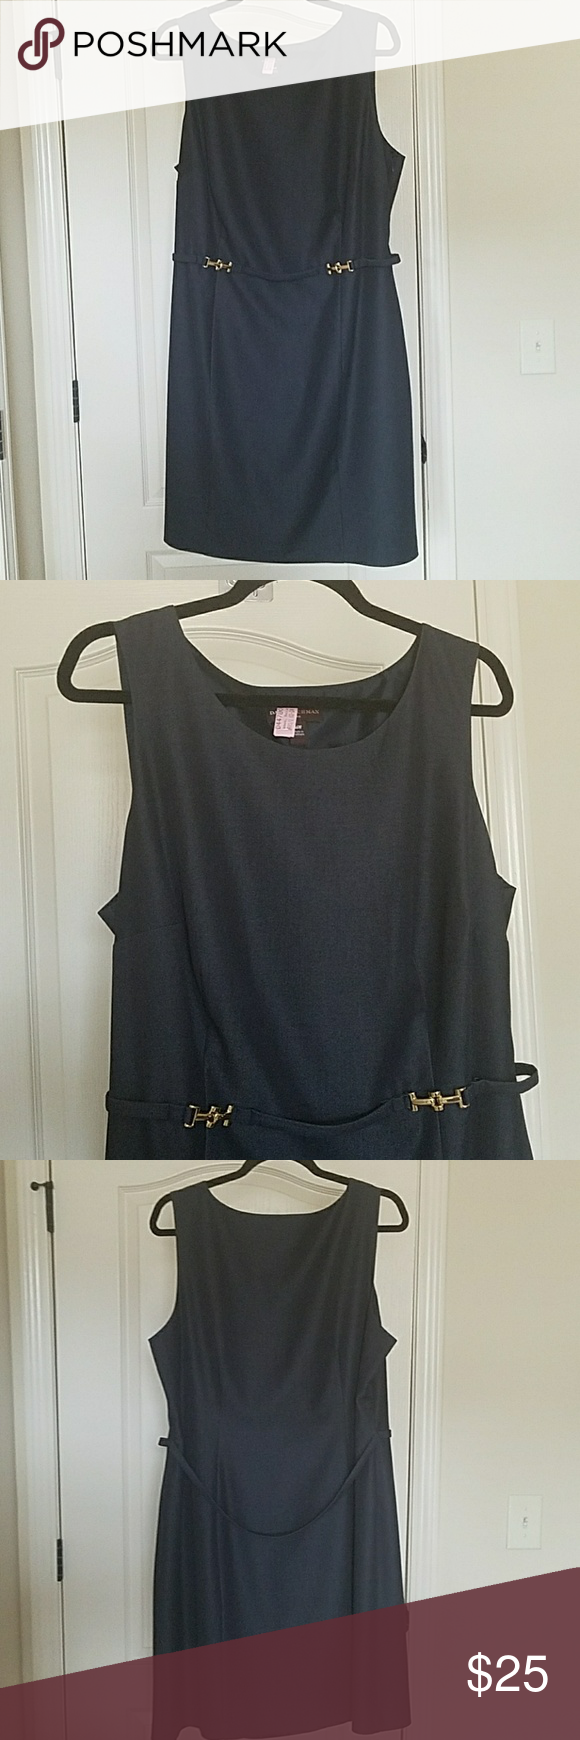 Dark denim blue short dress dark denim color shorts and nice dresses